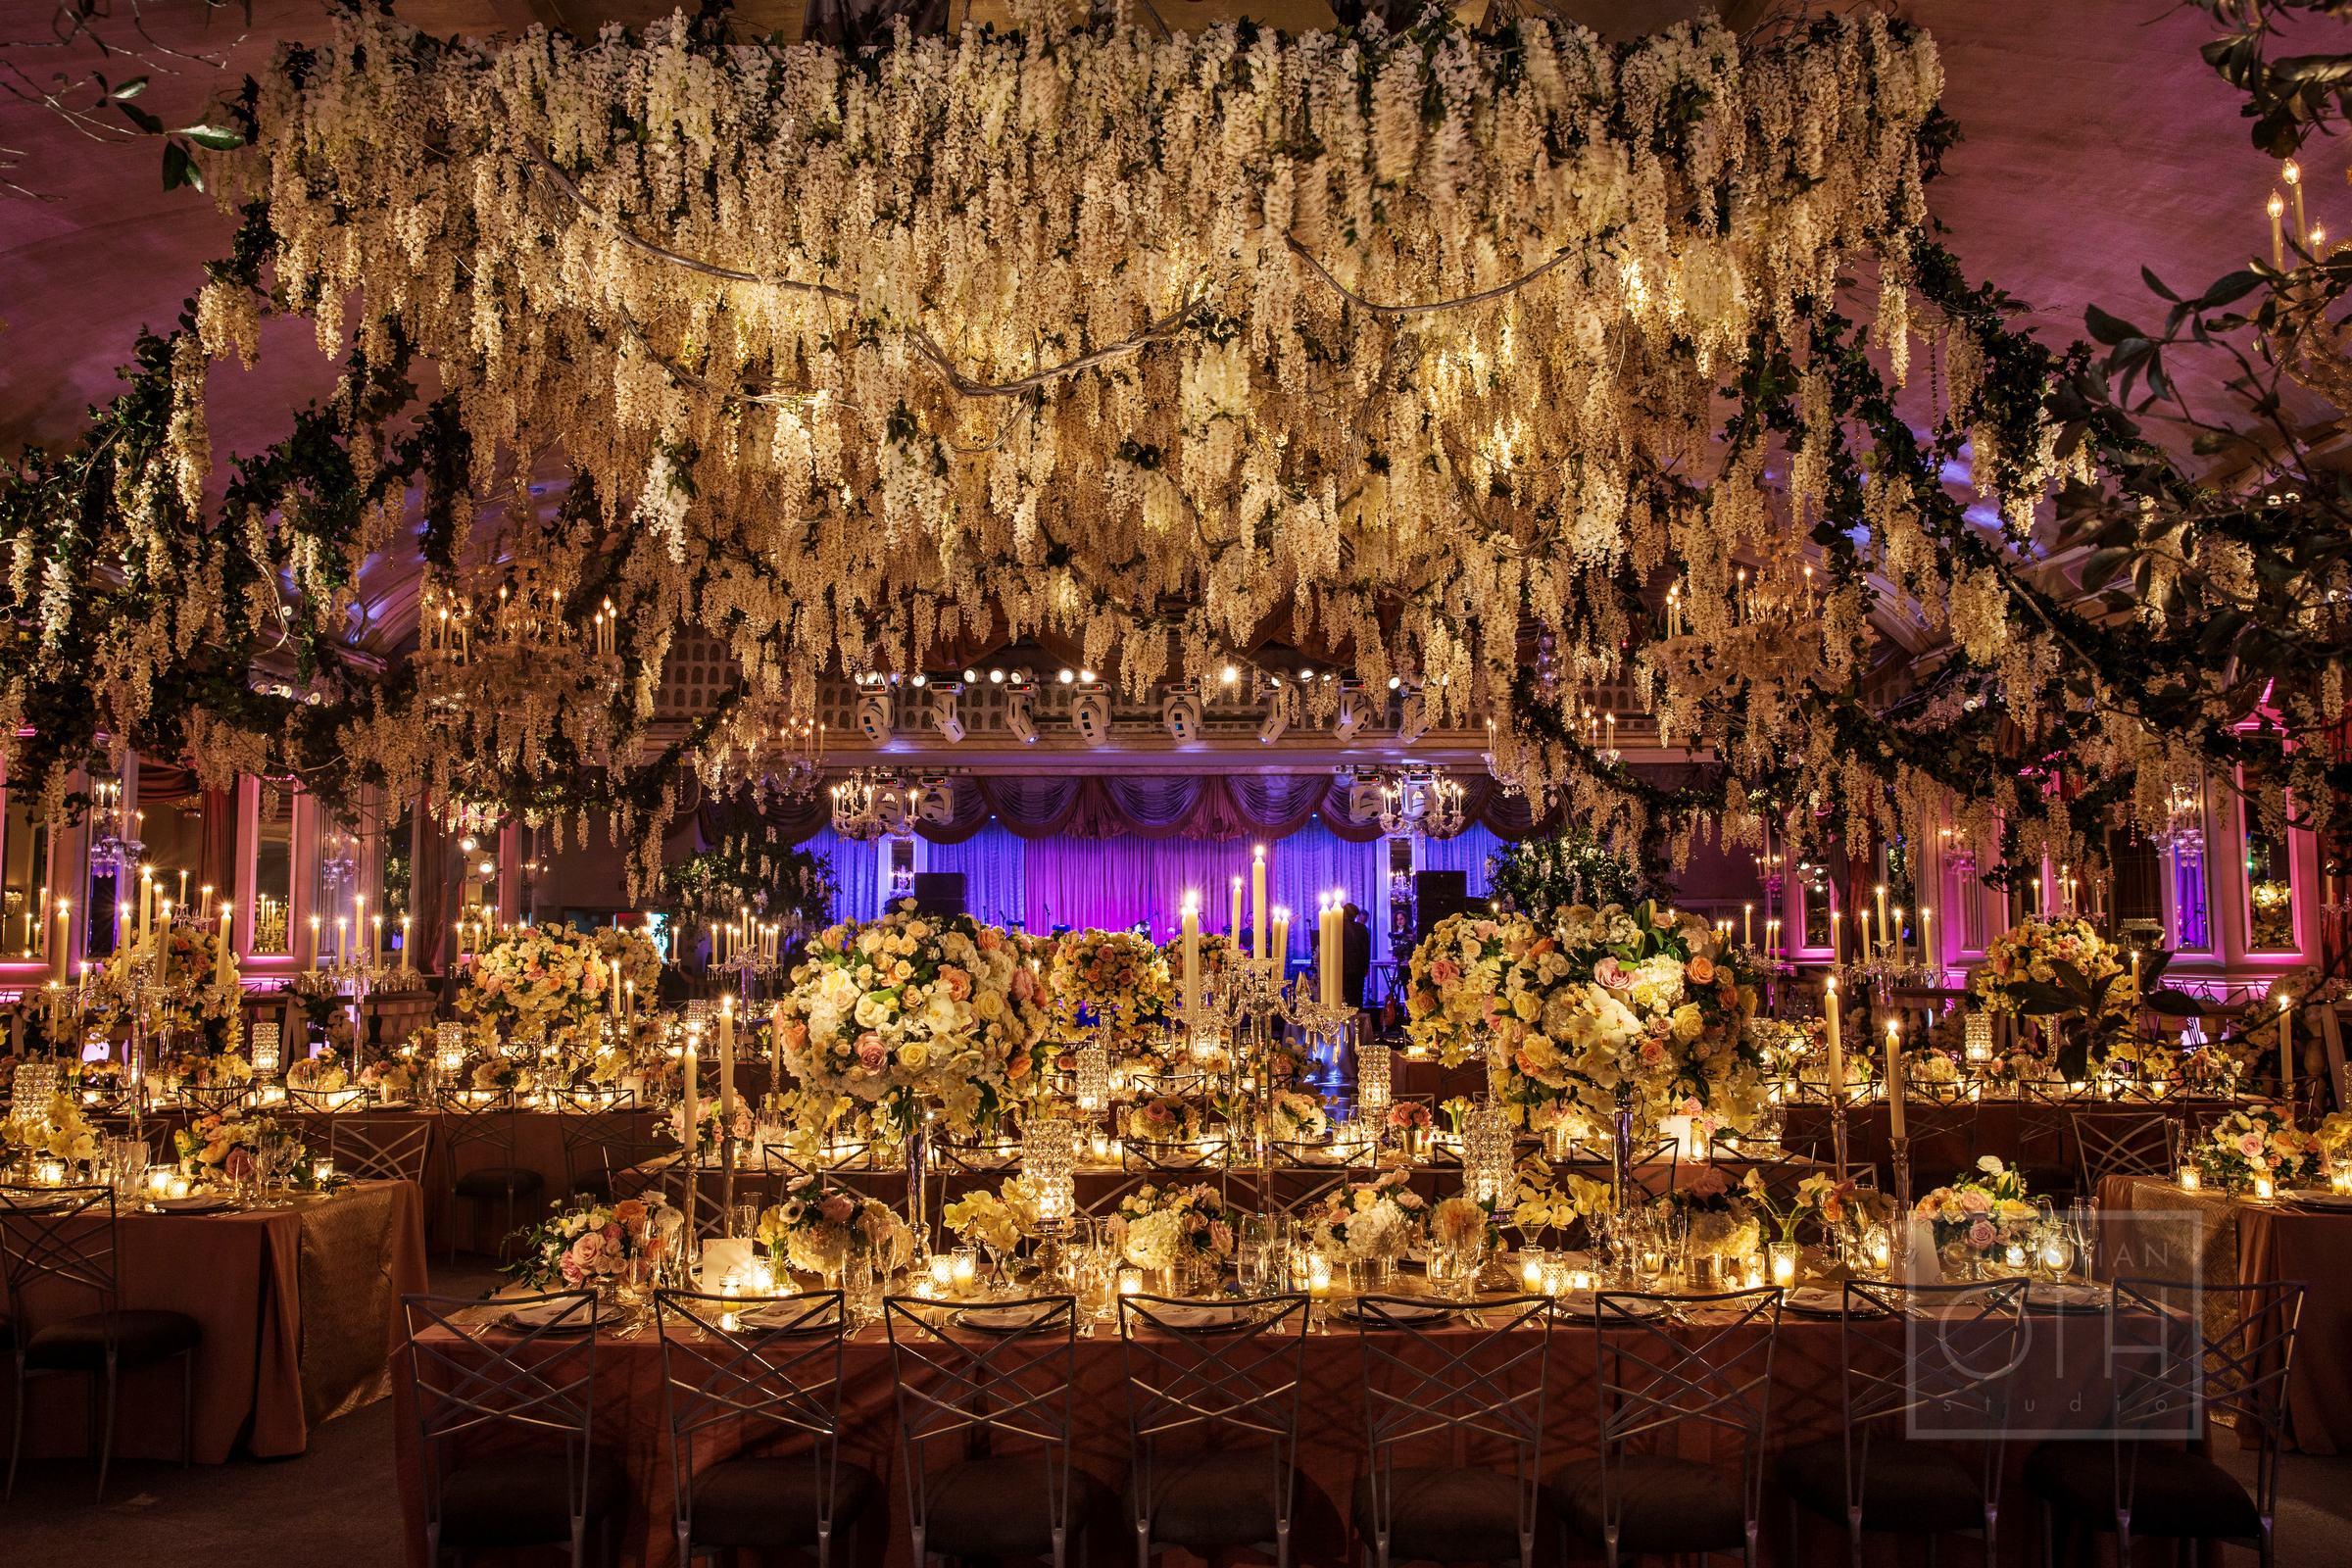 Ceci_New_York_Custom_Invitation_Pierre__City_ Destination_Wedding_Luxury_Personalized_Ceci_Style_Bride_Rose_Gold_Foil_Stamping125.JPG